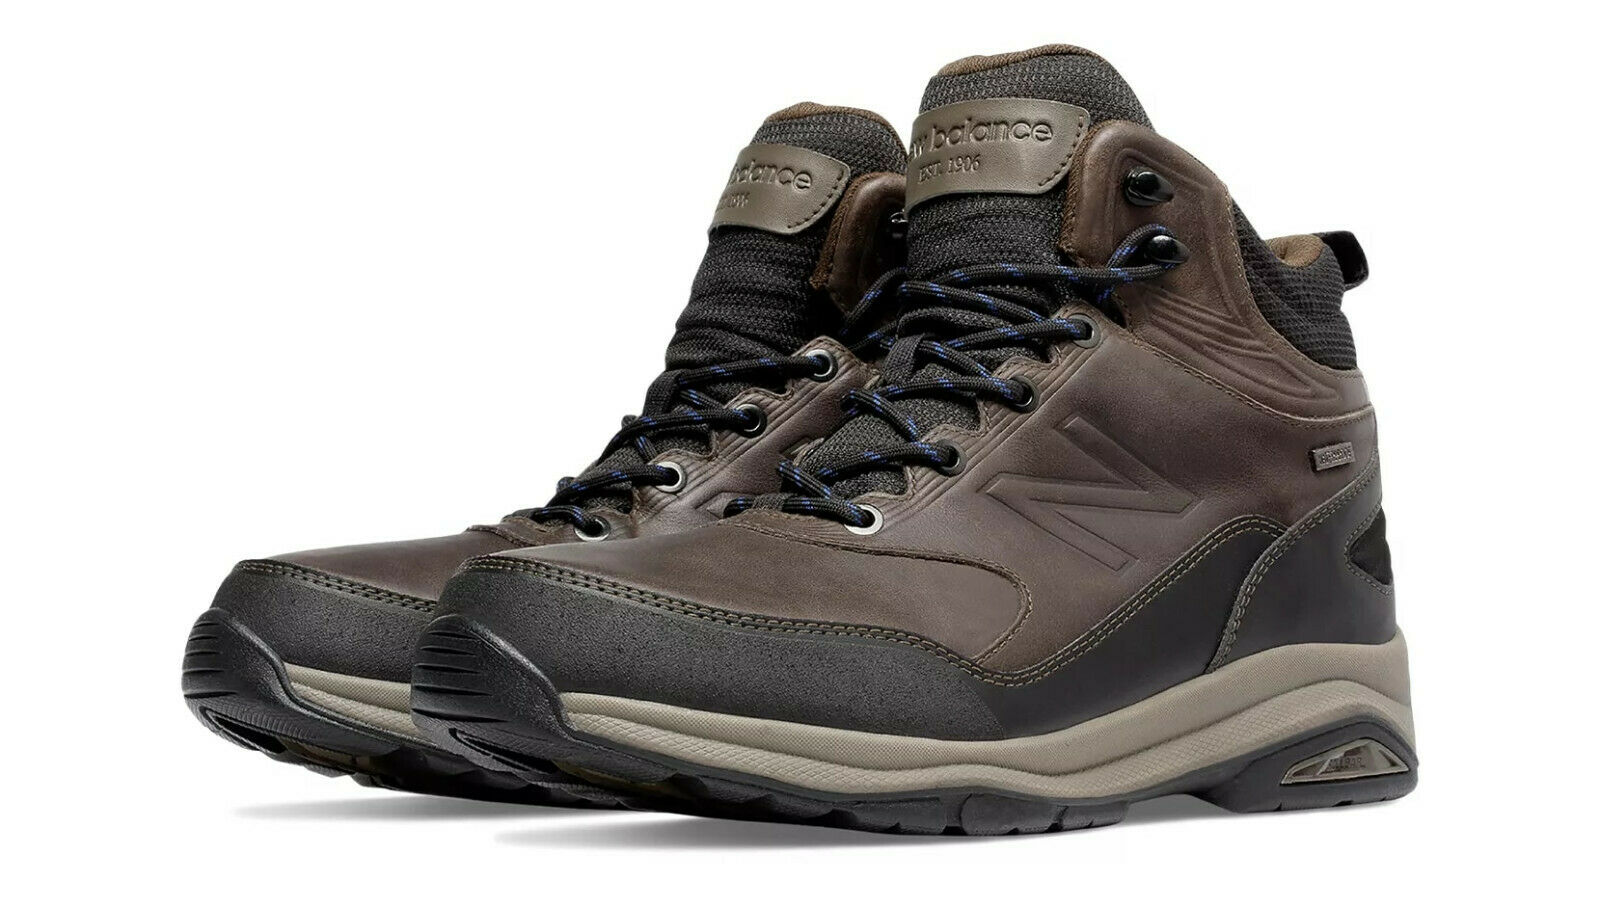 New Balance Men's MW1400DBv1 Waterproof Walking shoes, Dark Brown, Size 9EEEE